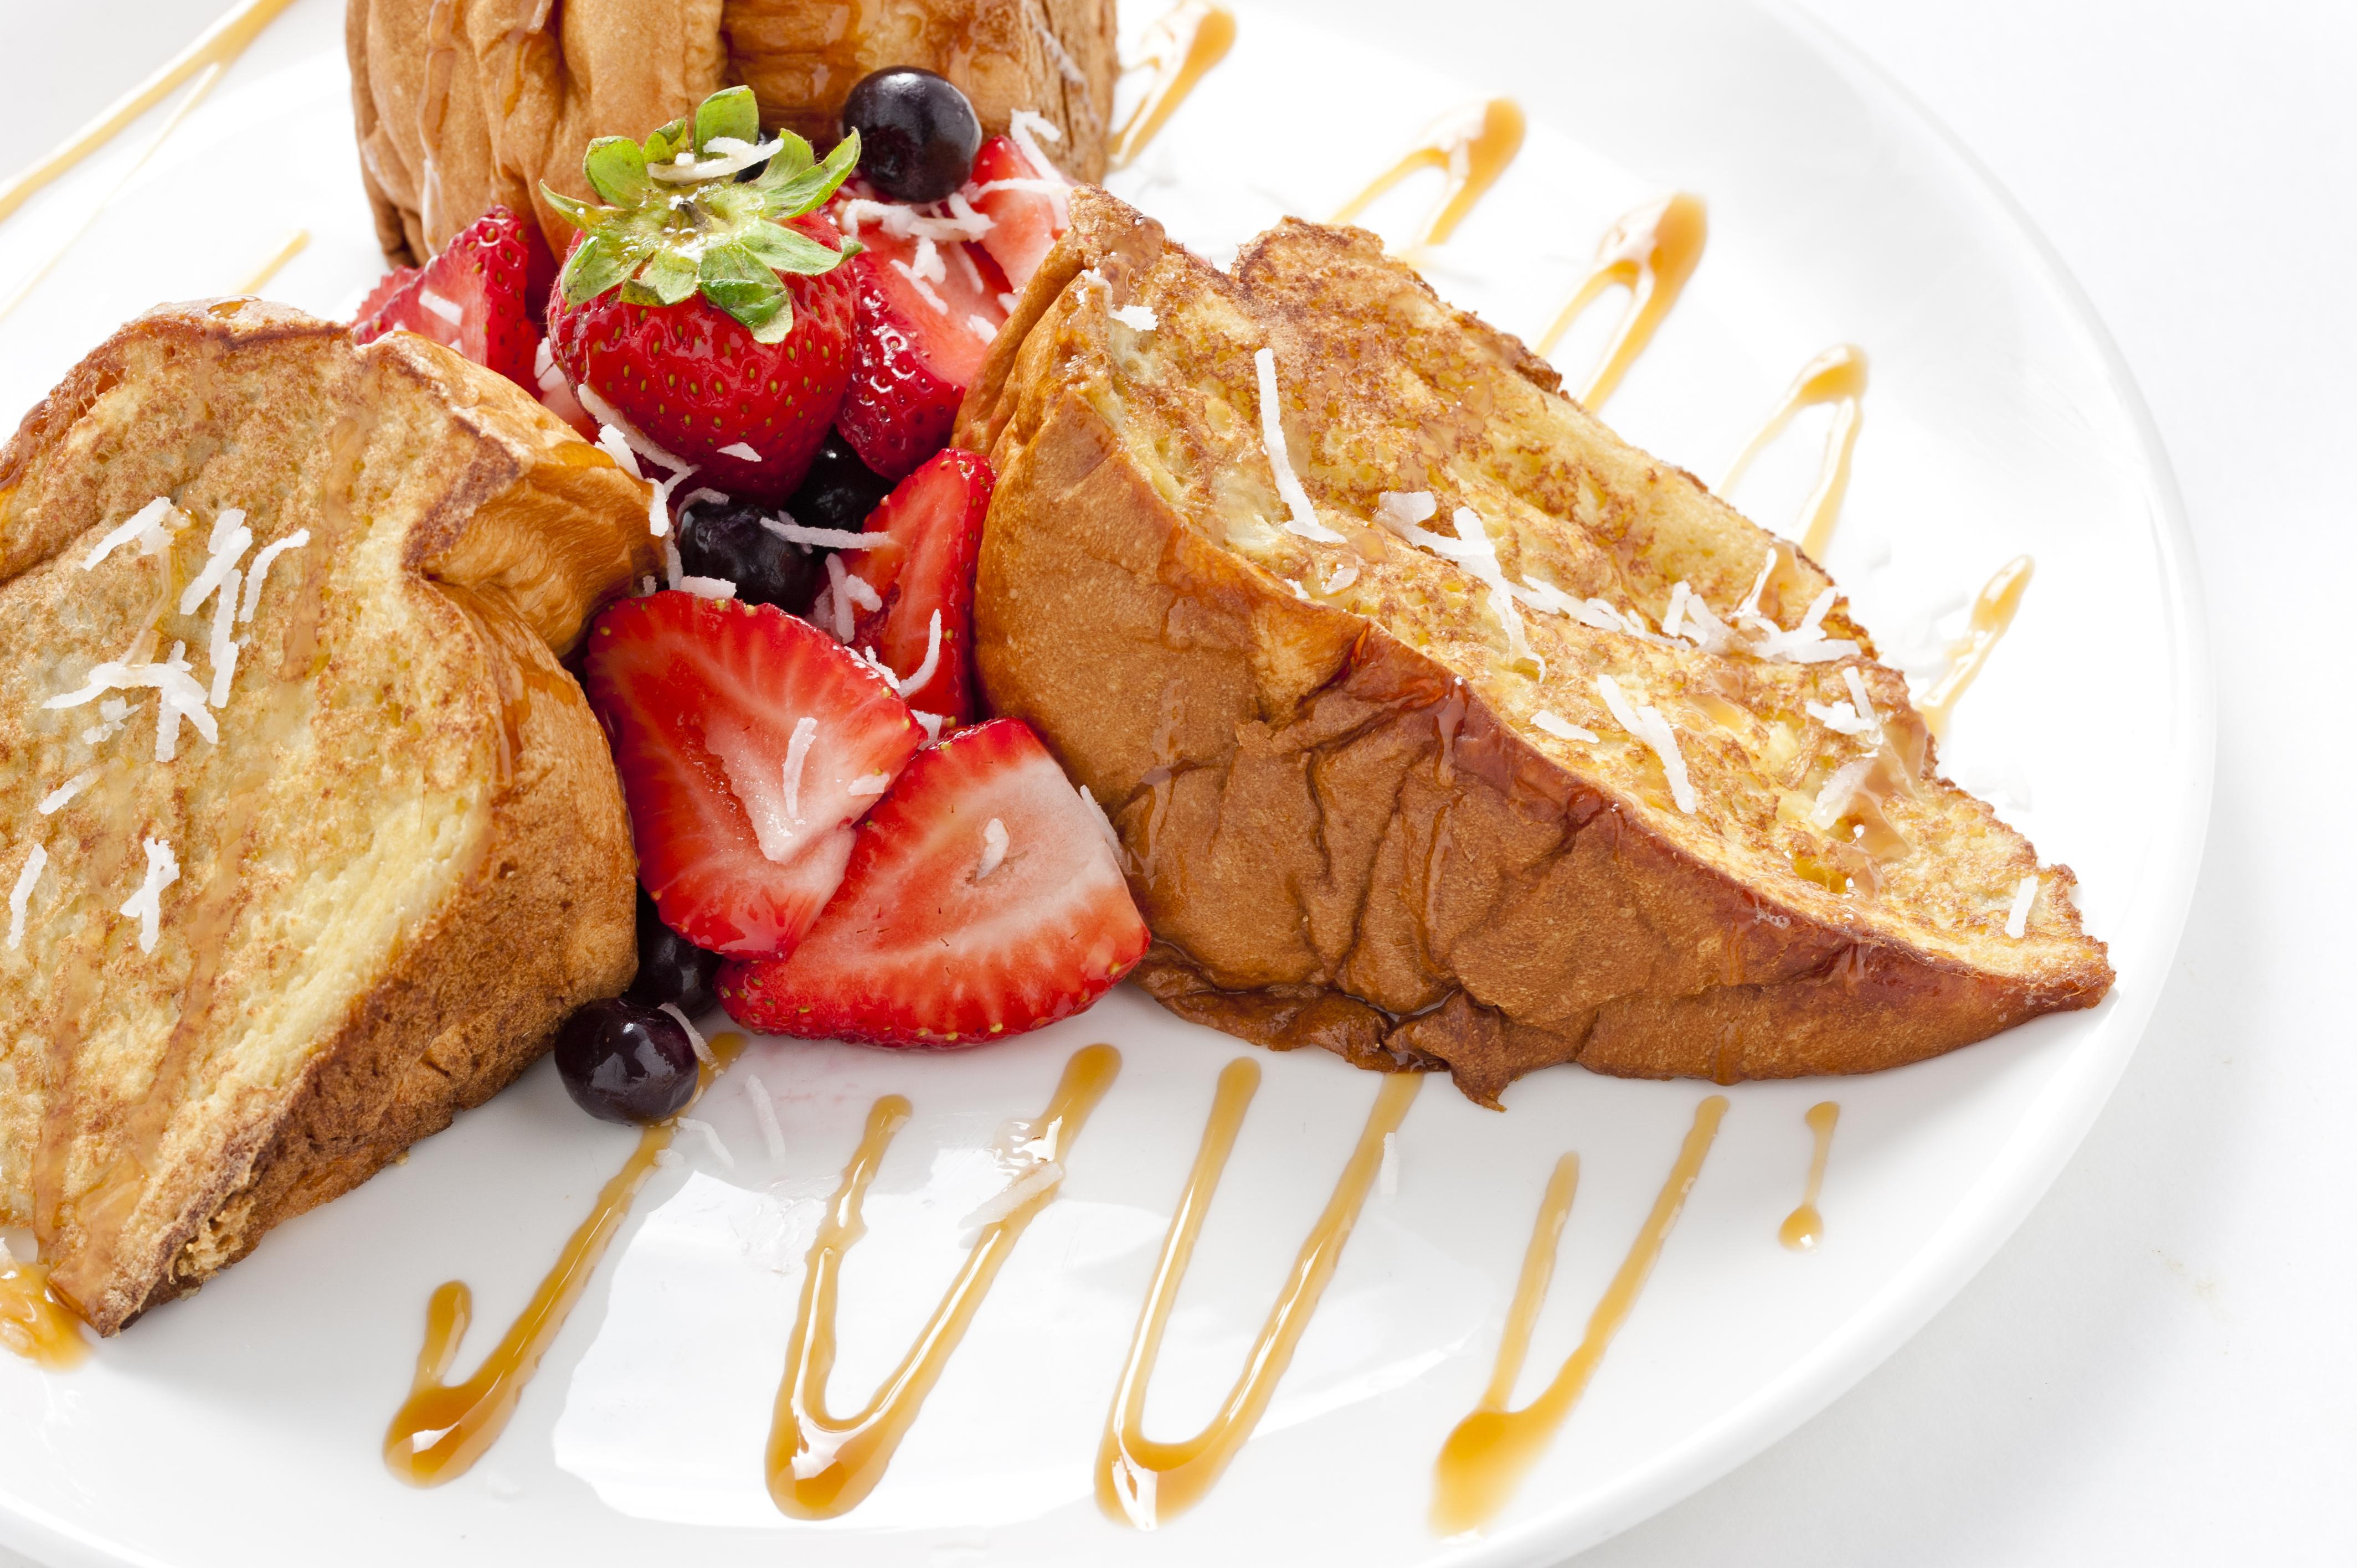 Tiki toast at The Broken Yolk Cafe